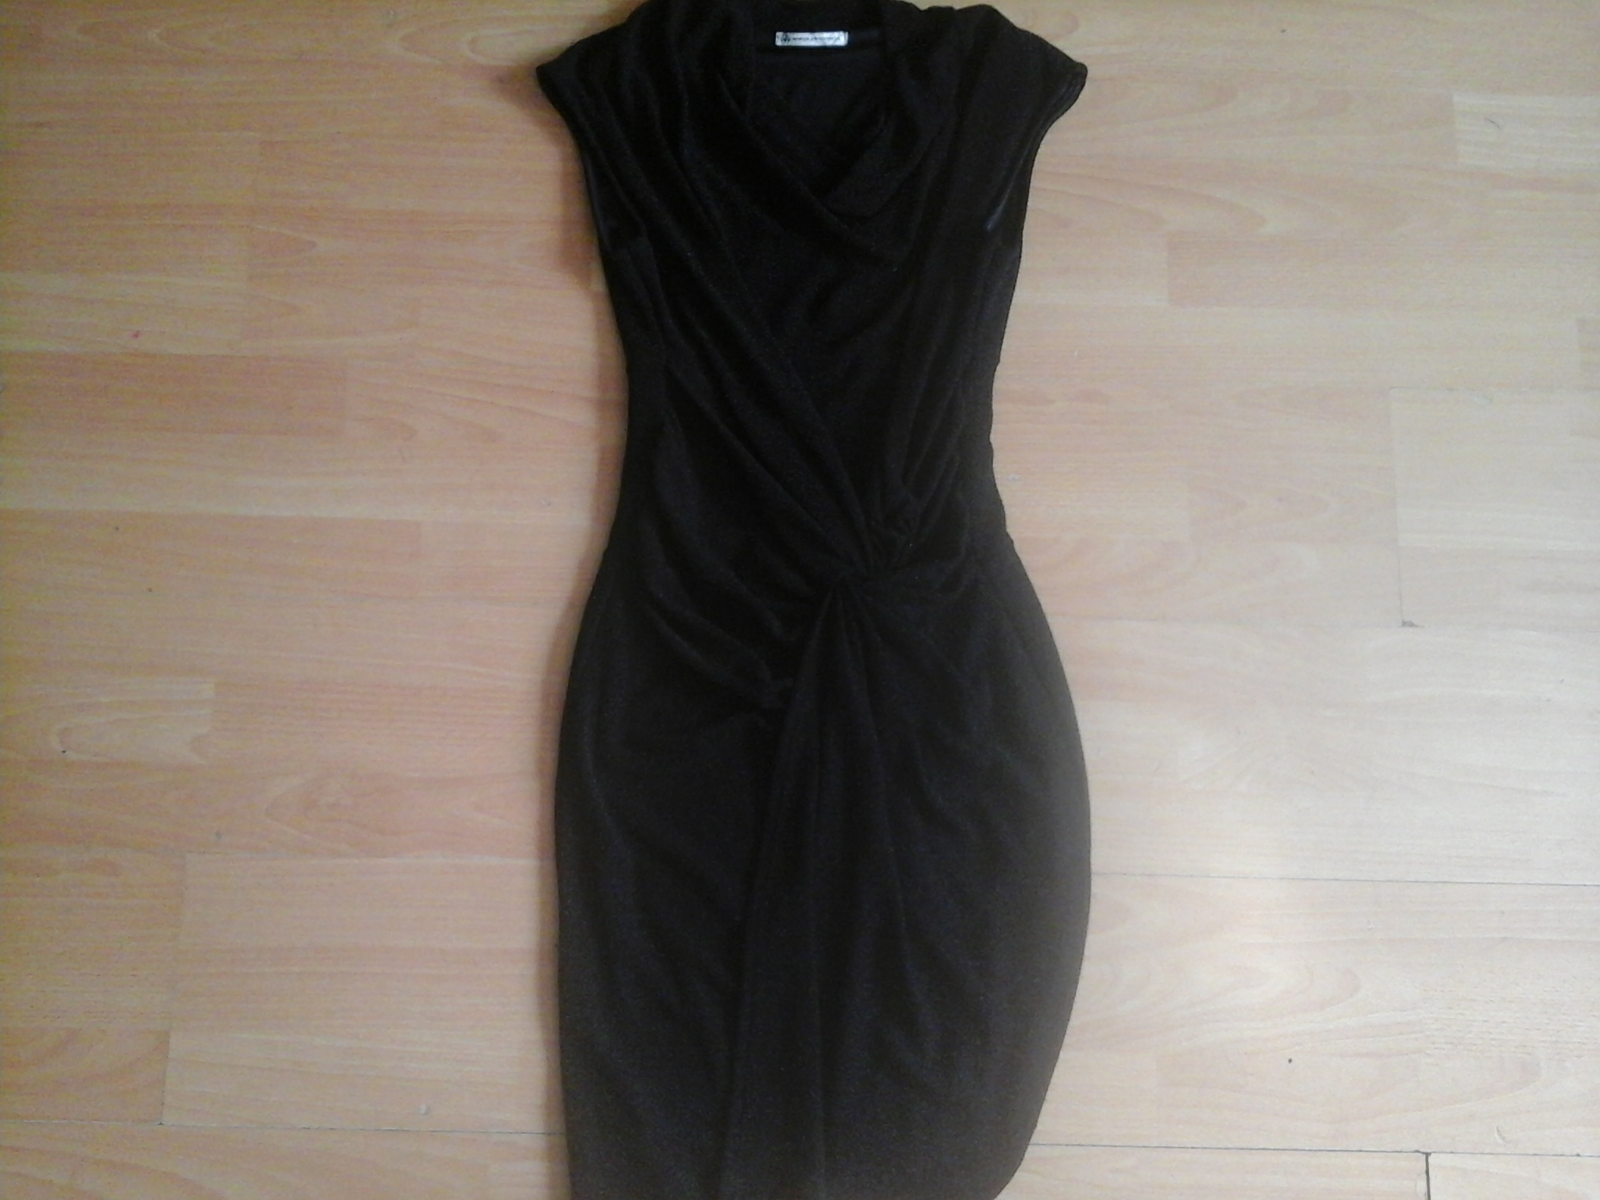 Womenus maille de moiselle black sparkly wiggle dress size